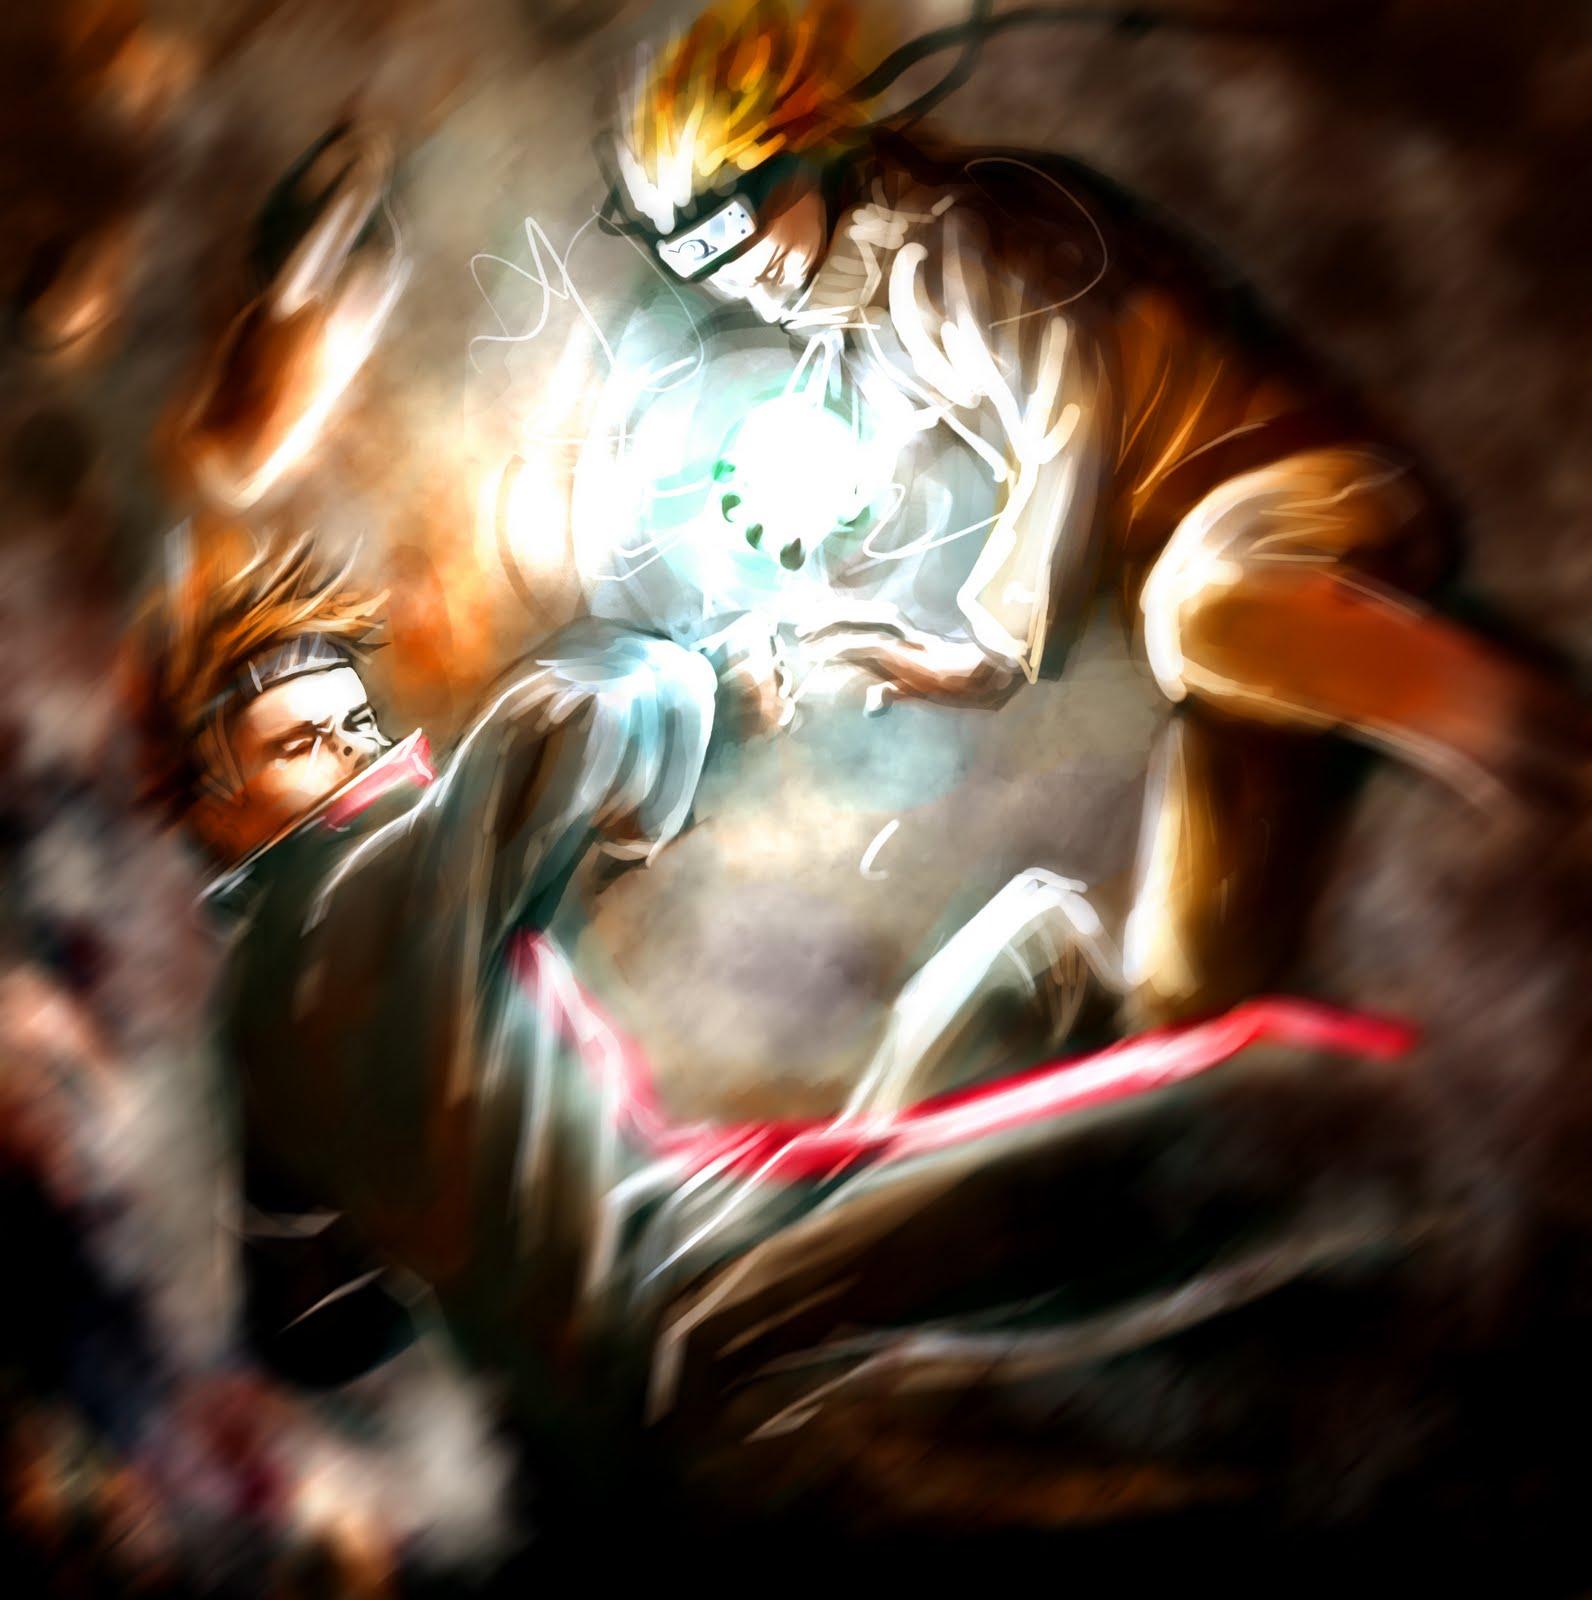 http://1.bp.blogspot.com/_mF_LOrA_8Xo/SyxNjvk4aoI/AAAAAAAAAA8/22O69KMayuU/s1600/Naruto_Vs_Pain_by_moni158.jpg